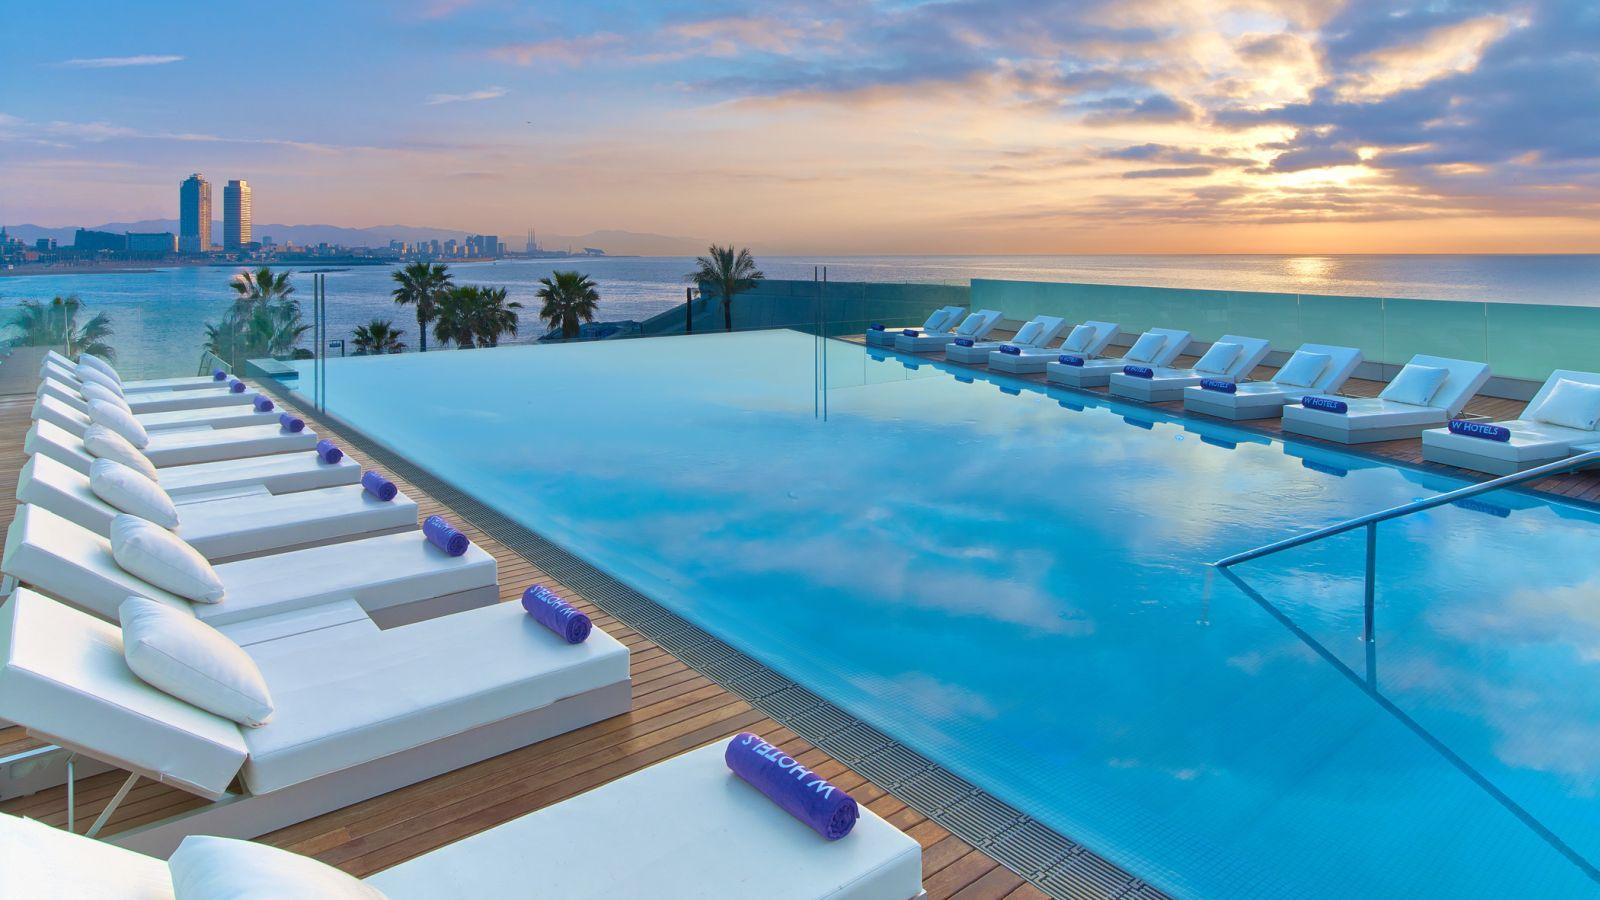 Hotel Barcelone : Plus De 500 Hôtels À Barcelone à Hotel Barcelone Avec Piscine